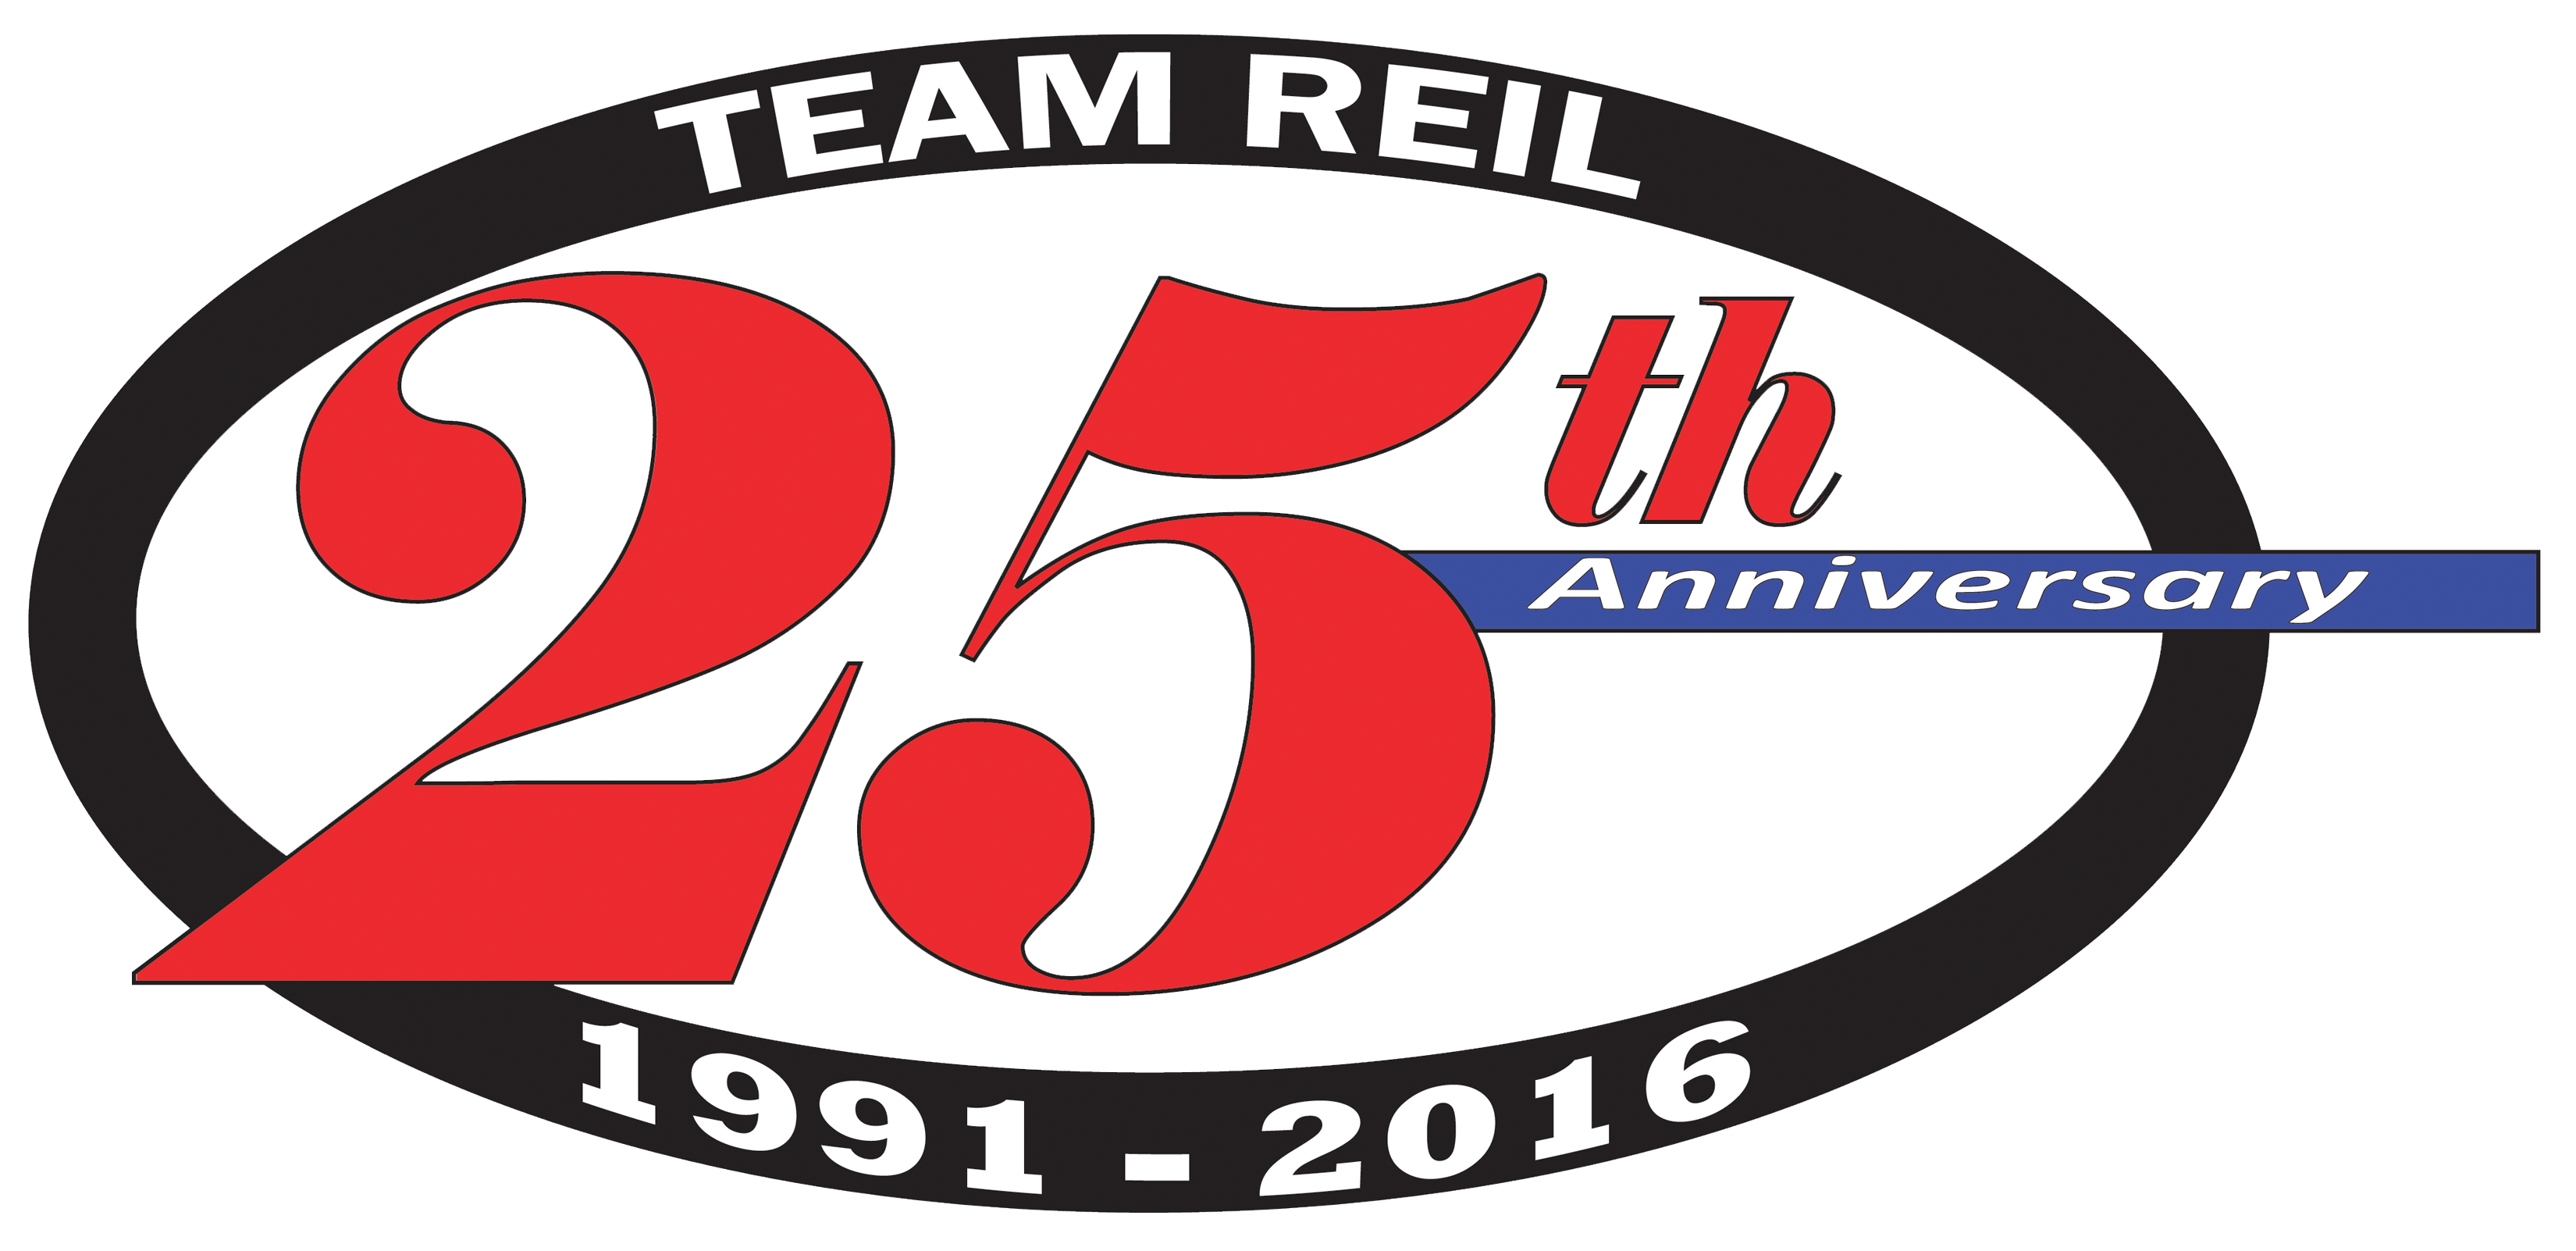 Team REIL